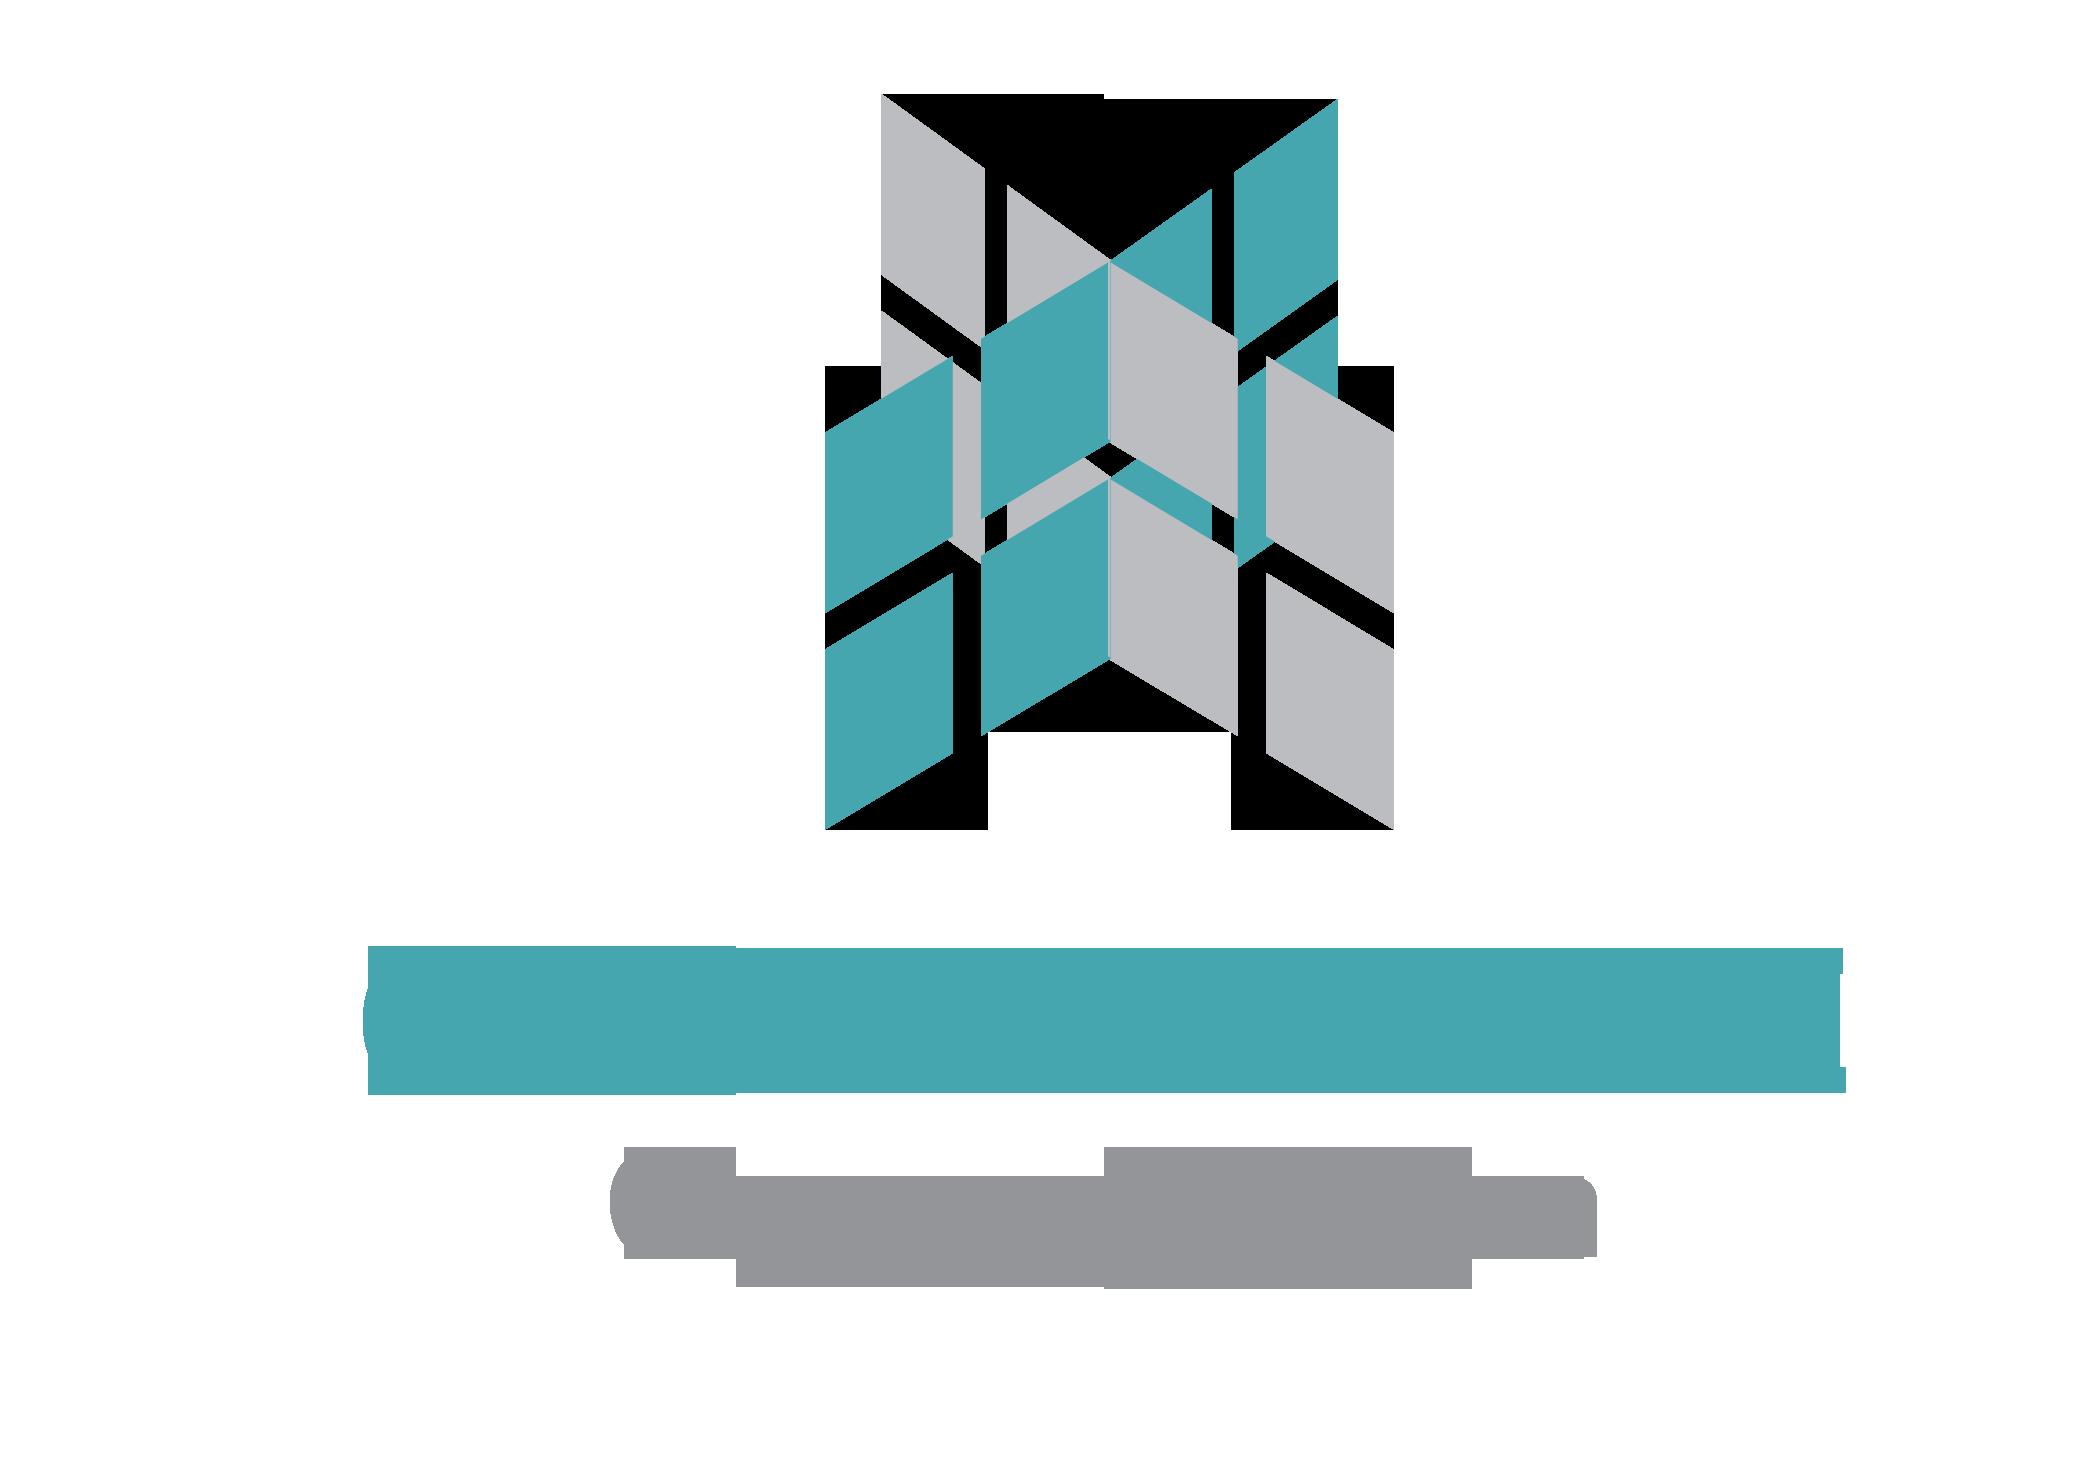 50 Free PSD Company Logo Designs To Download Logo Image.